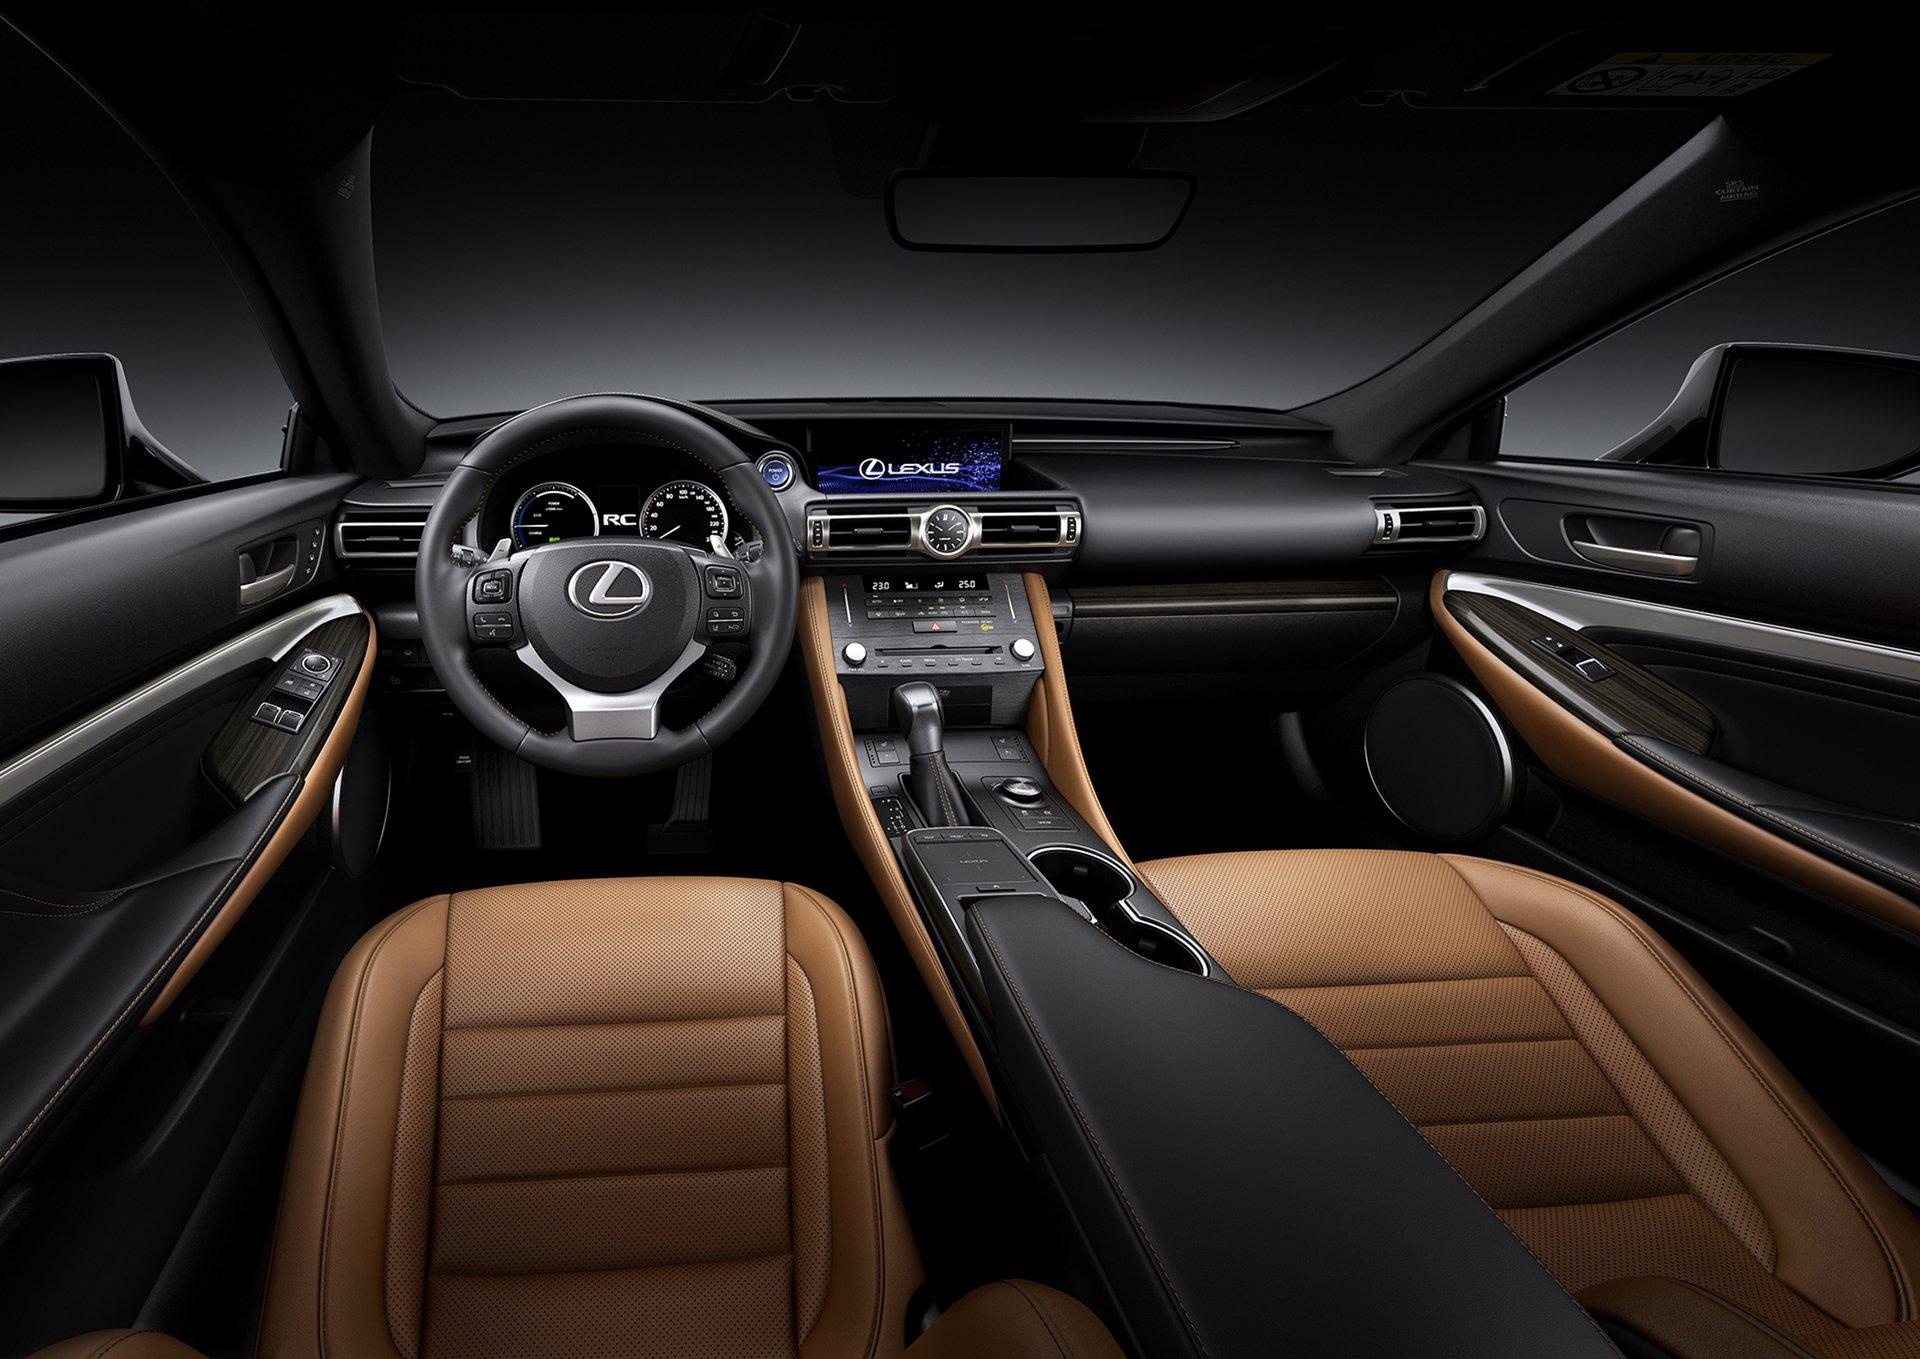 Lexus RC facelift 2019 (13)